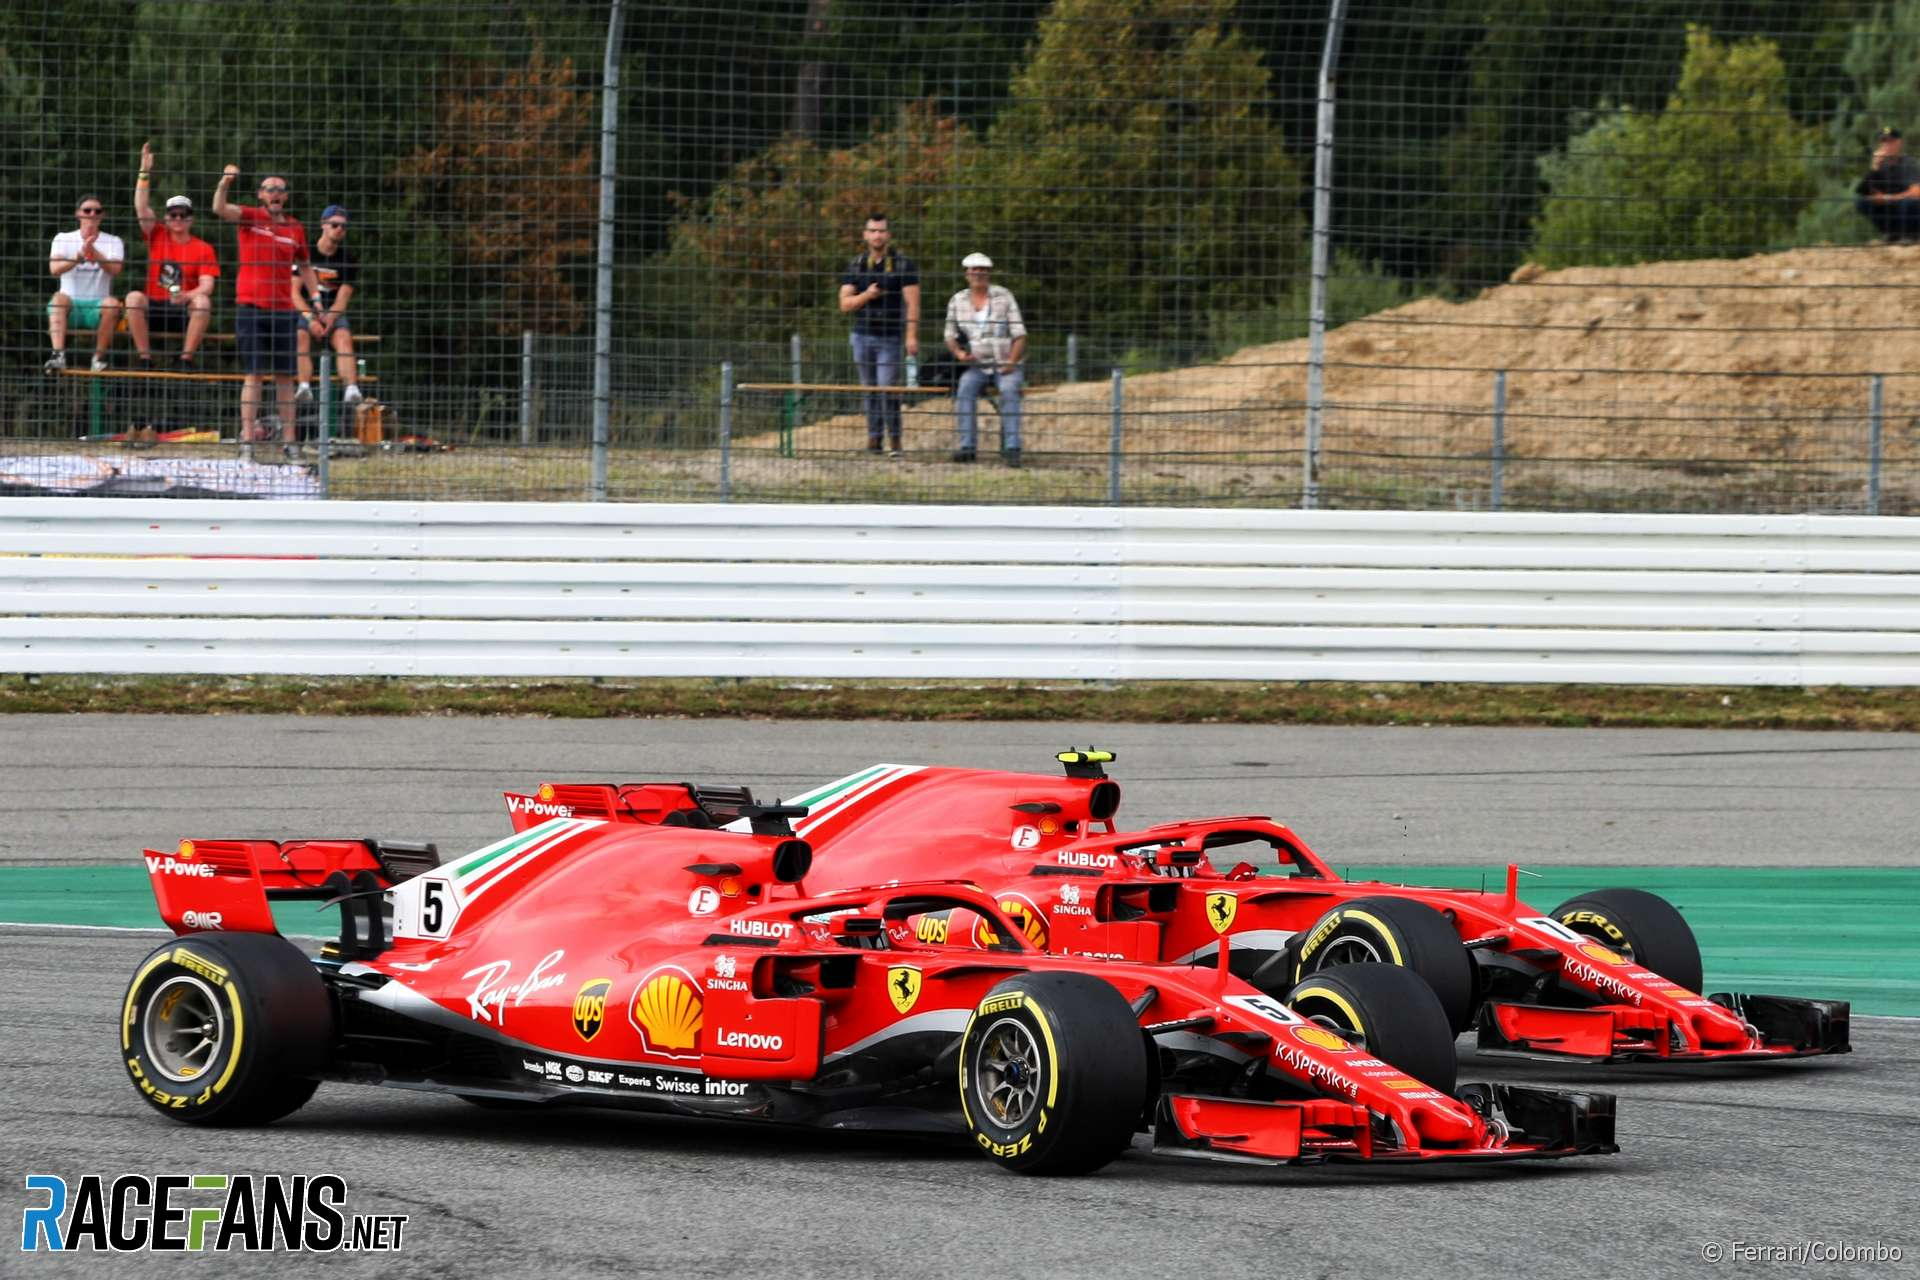 Sebastian Vettel, Kimi Raikkonen, Ferrari, Hockenheimring, 2018